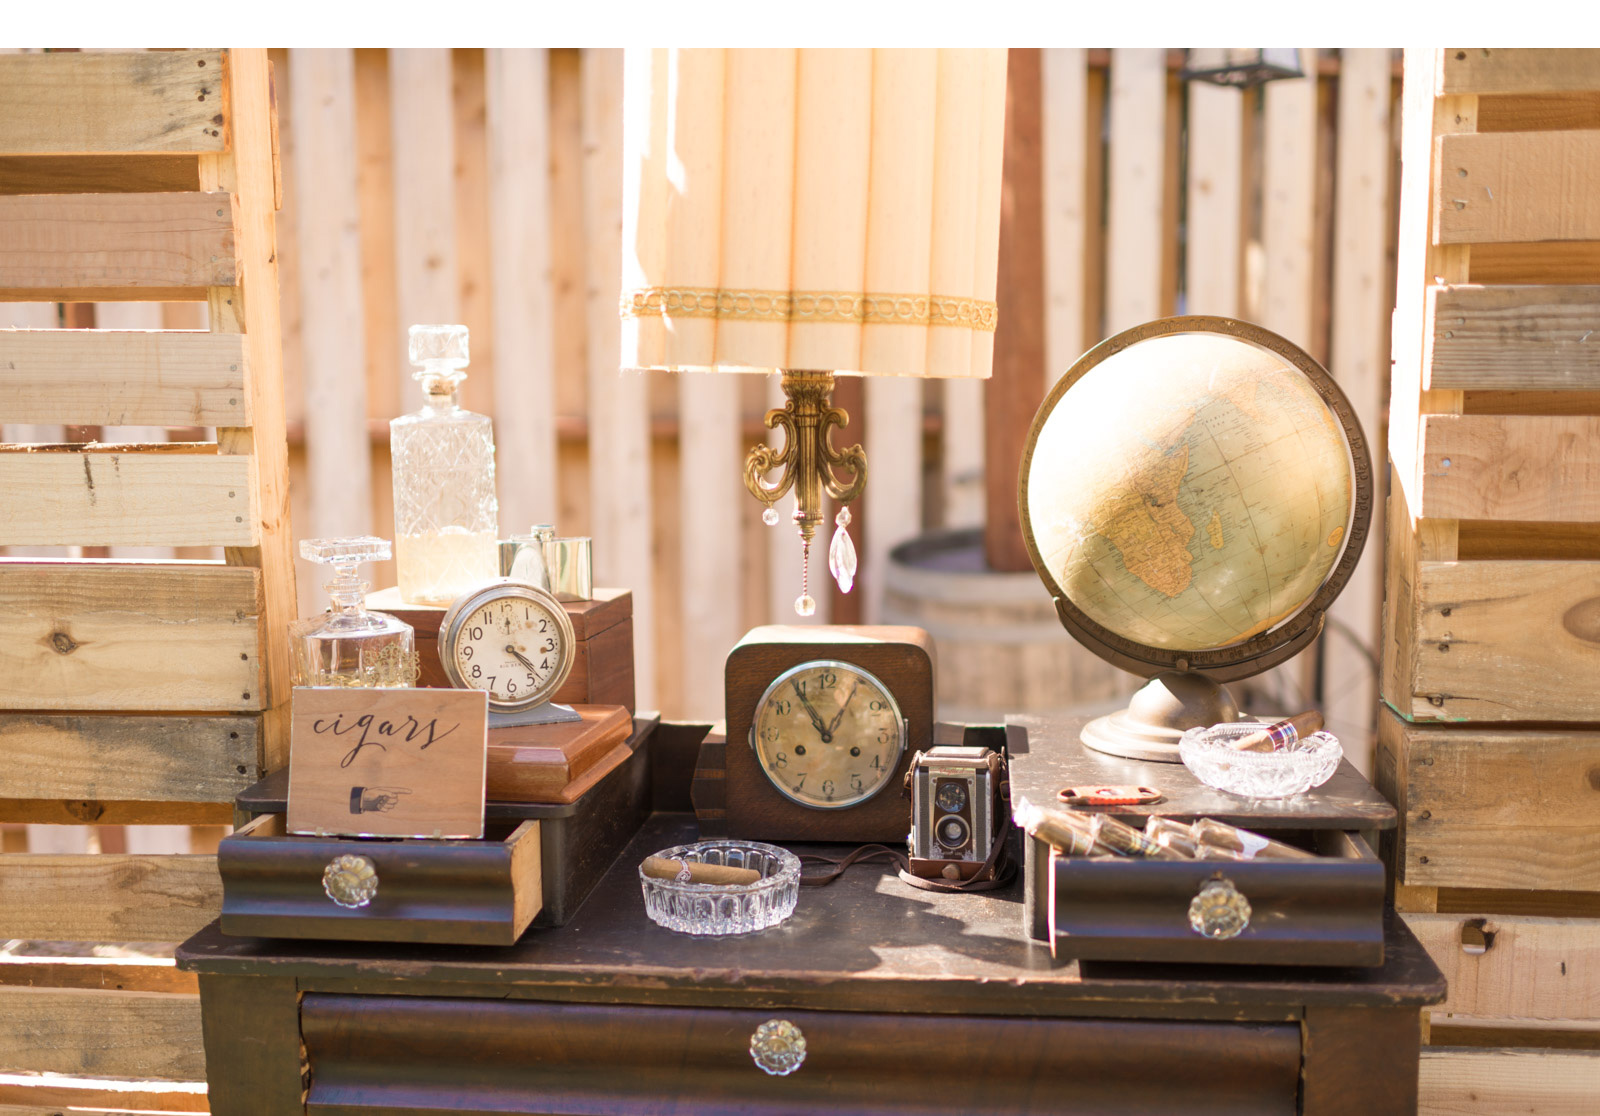 Temecula-Winery-Wedding-Natalie-Schutt-Photography_04.jpg